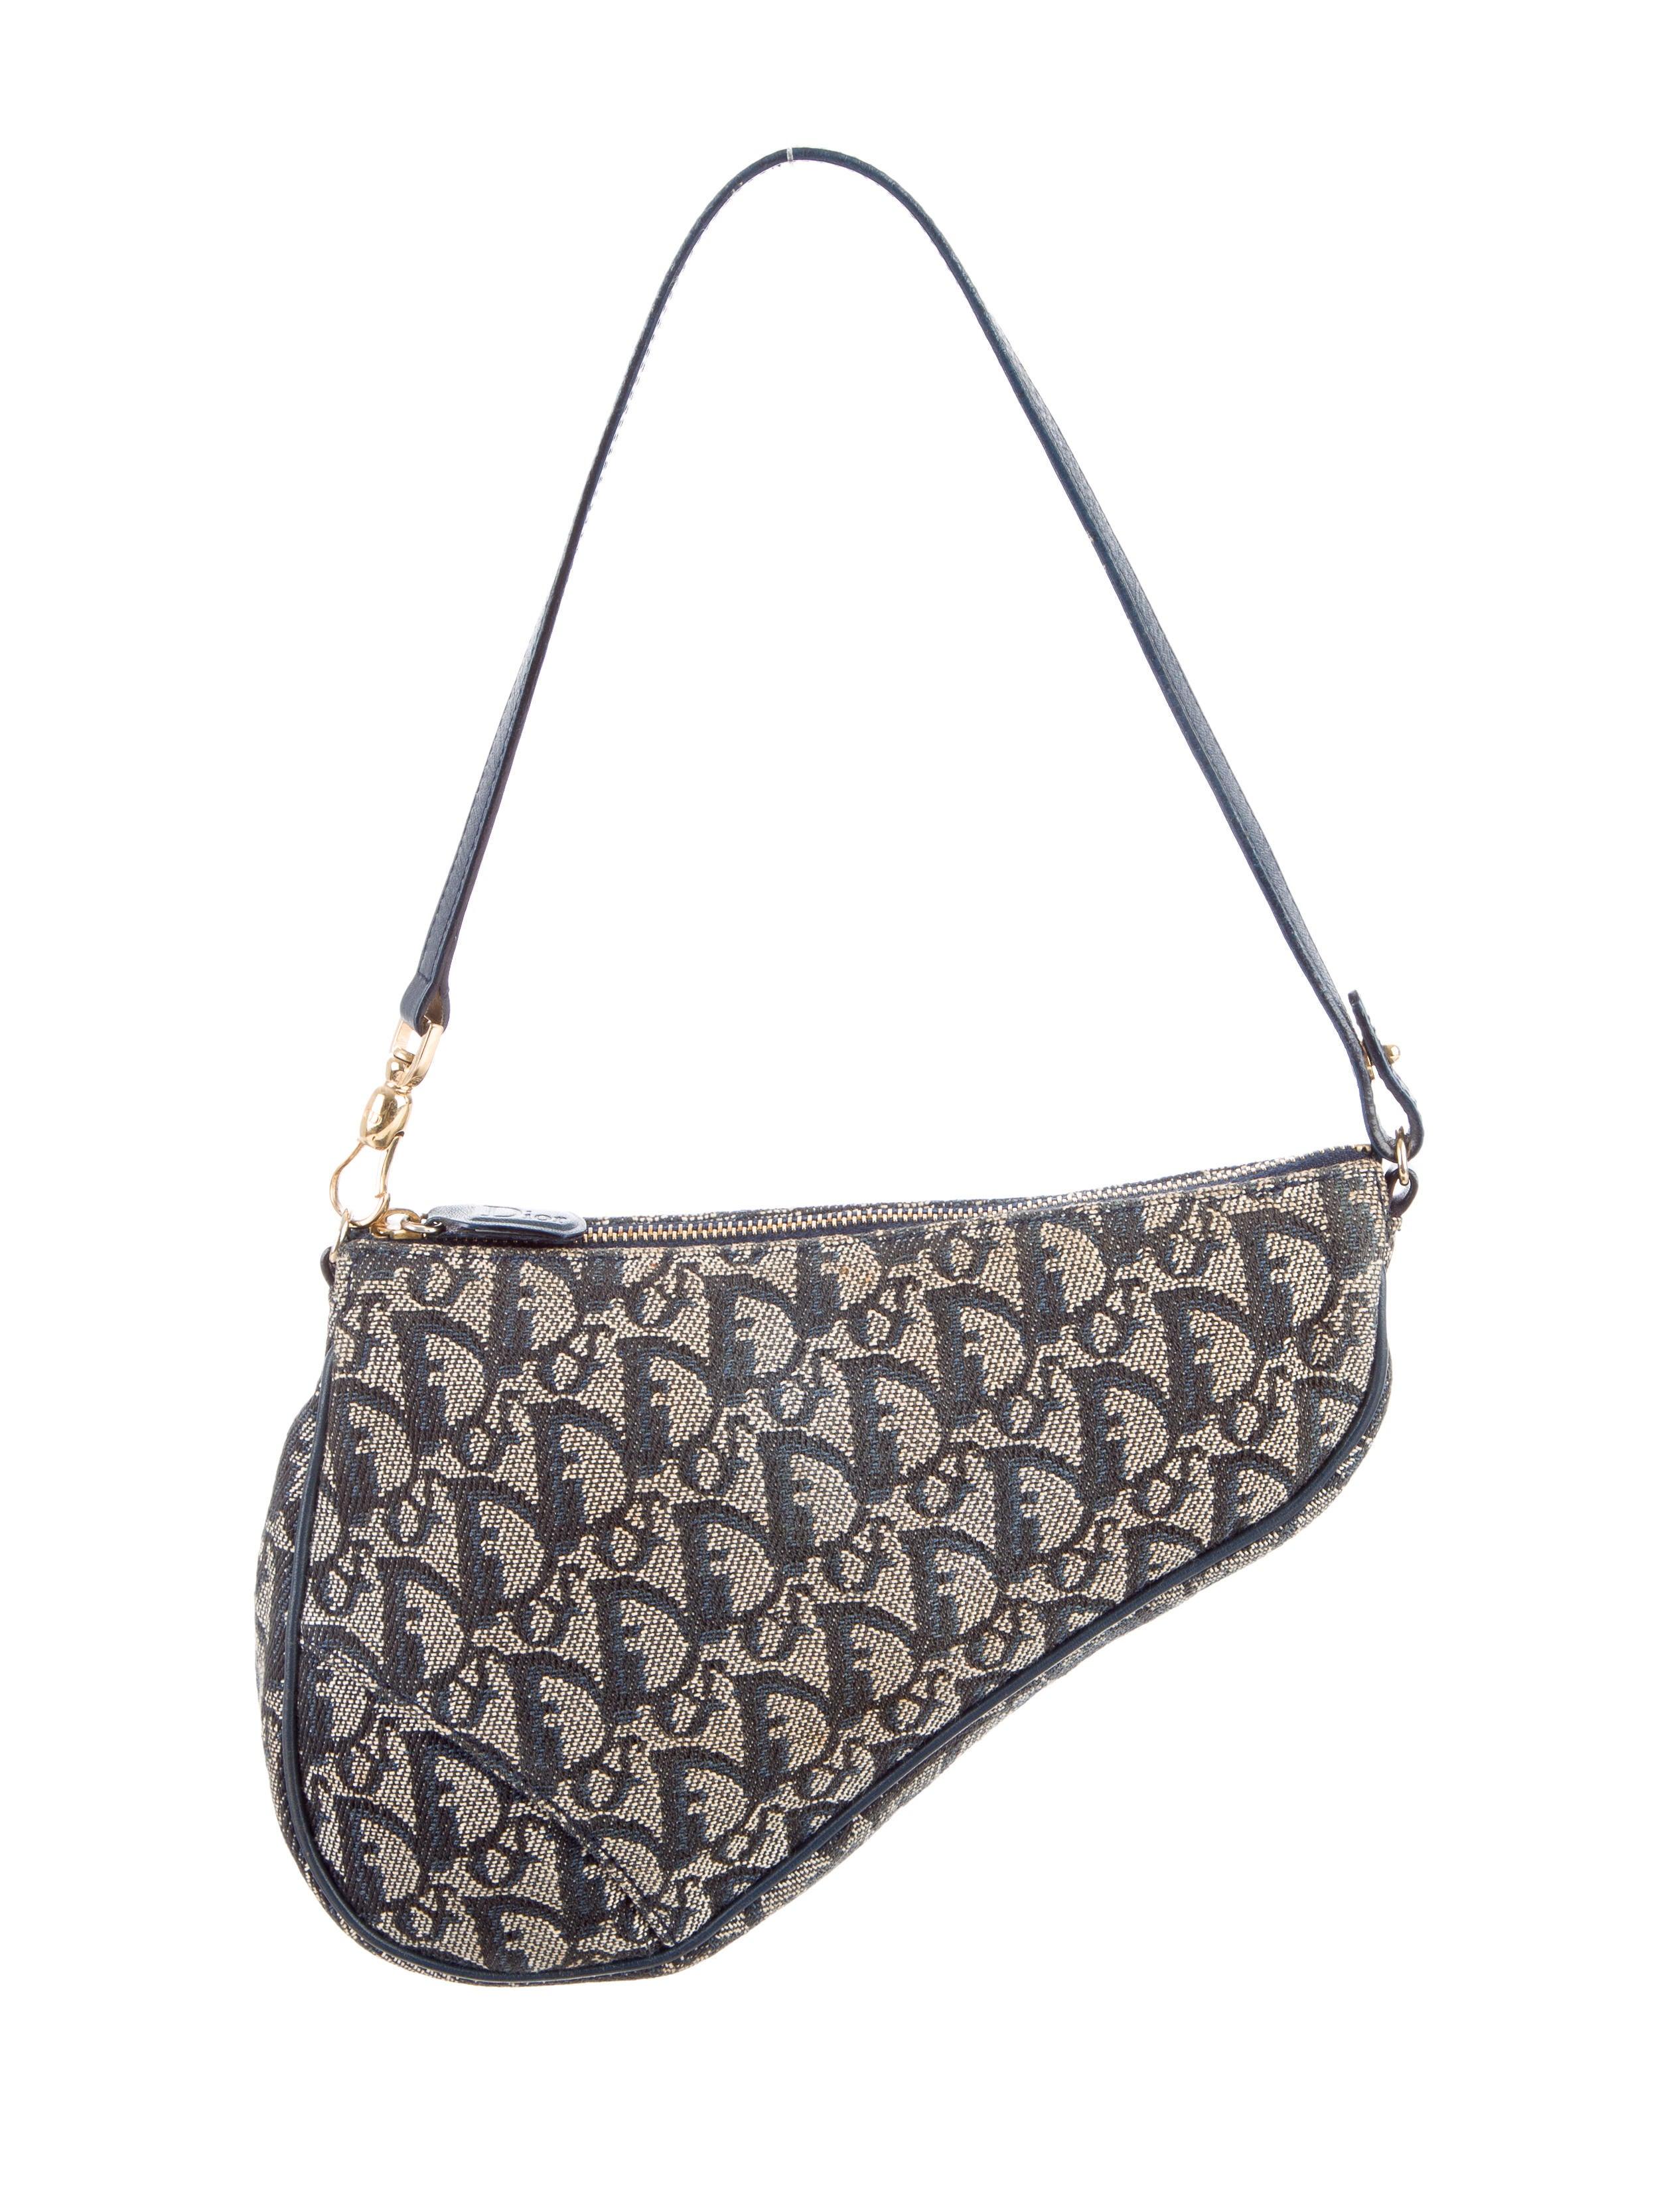 6ea24b3f851 Christian Dior Oblique Saddle Bag - Handbags - CHR59675 | The RealReal